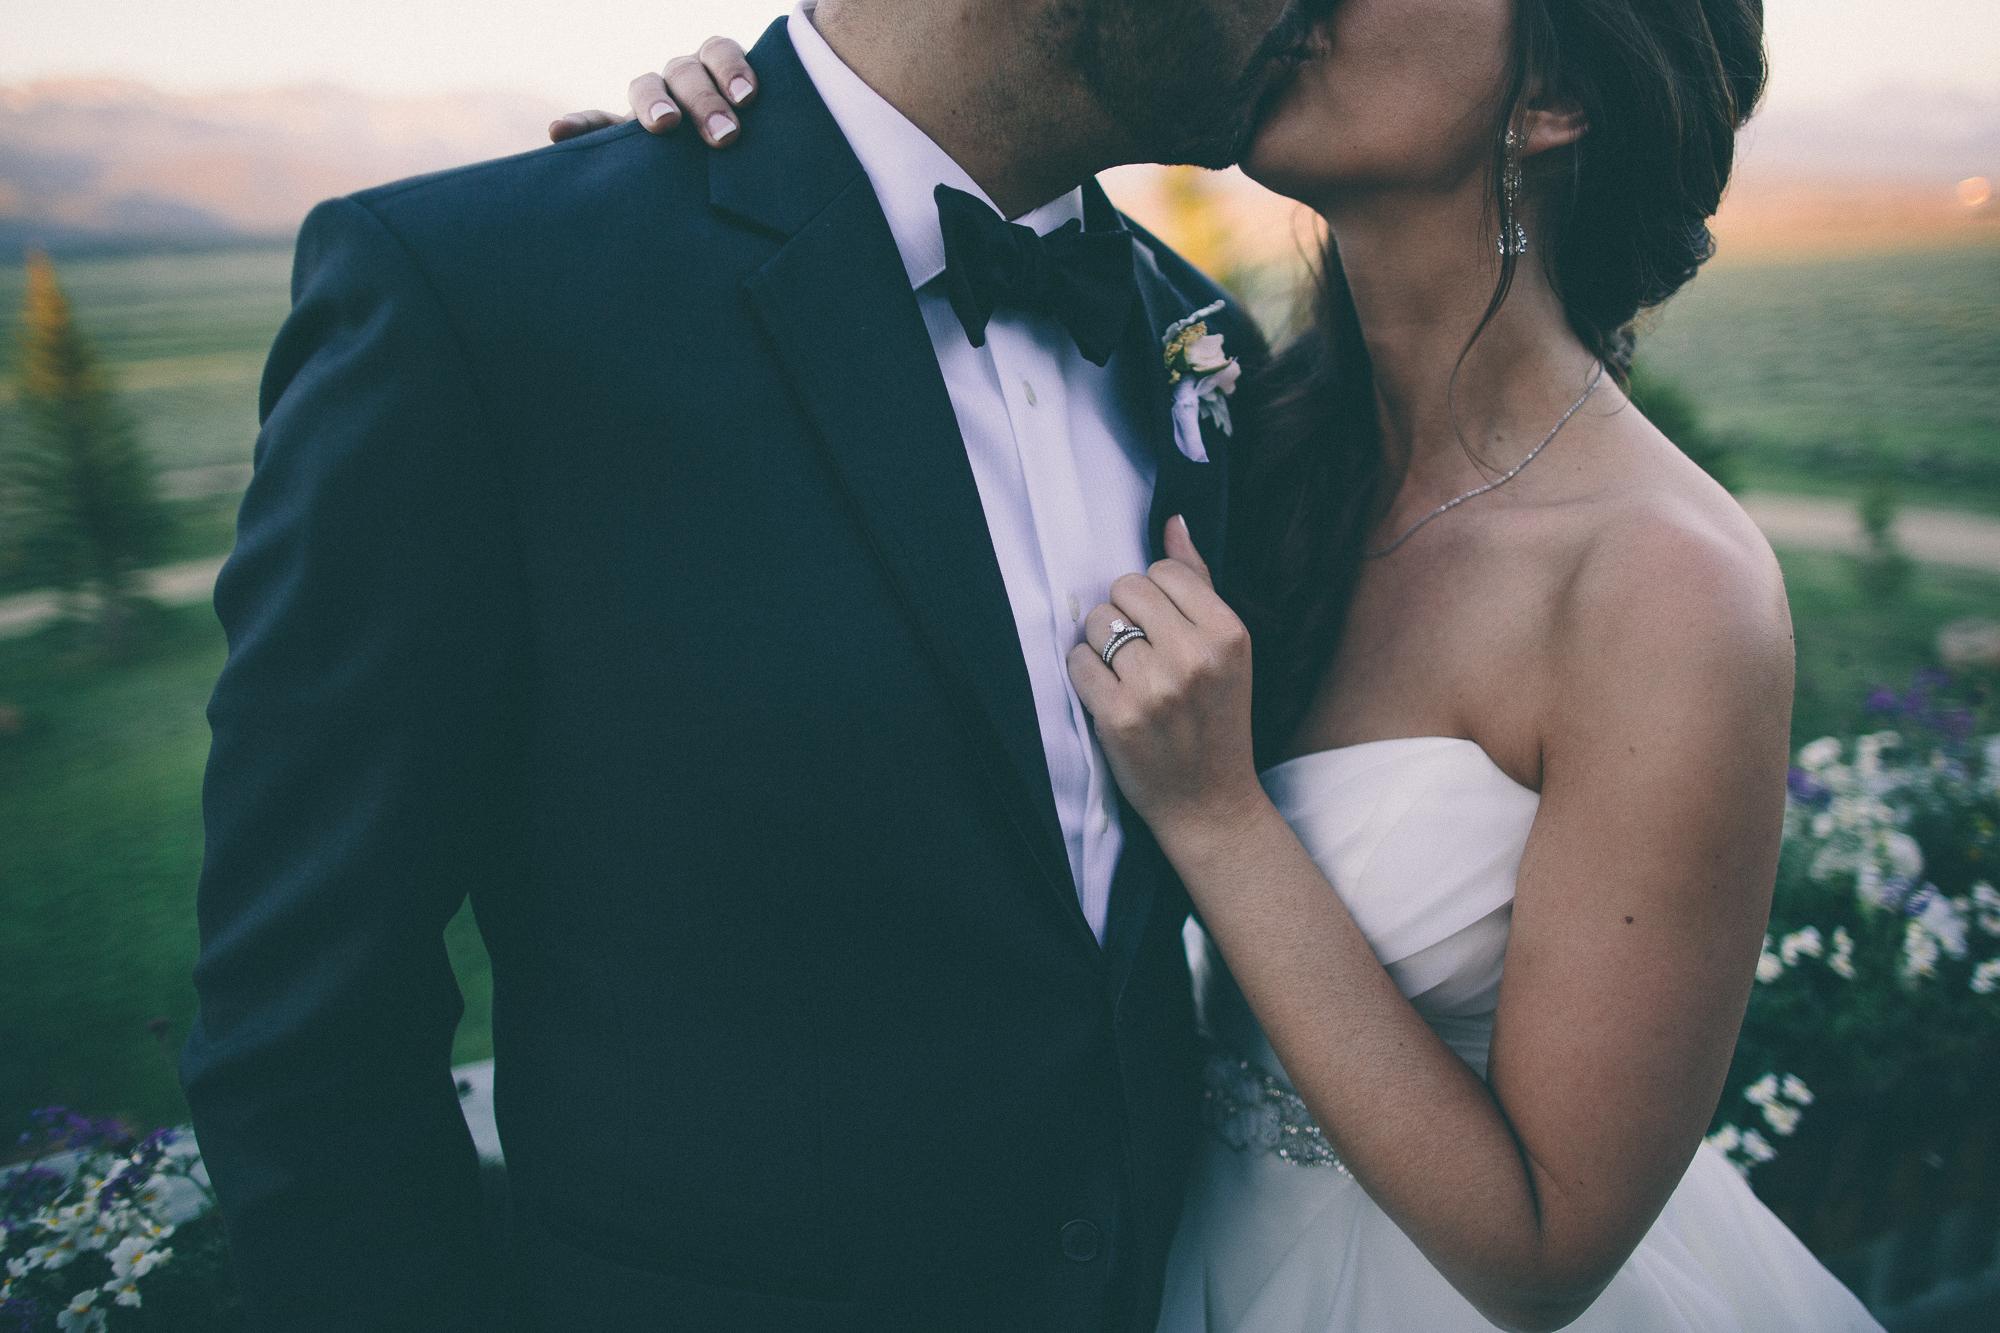 MP_16.06.19_Michael & Brittany Wedding-6951.jpg